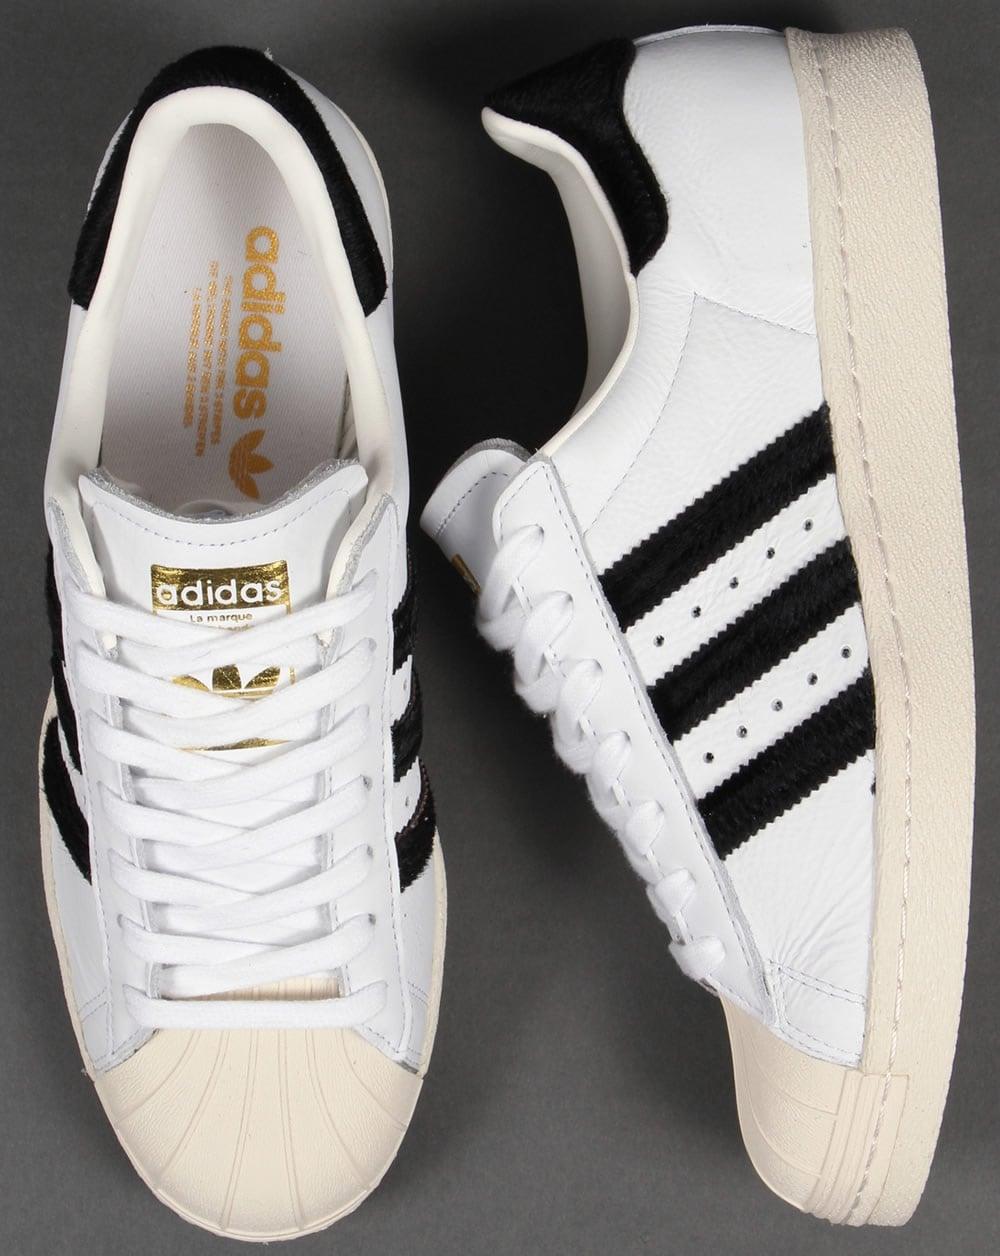 Adidas Superstar Degli Anni '80 In Bianco Pony Bianco ap0t5